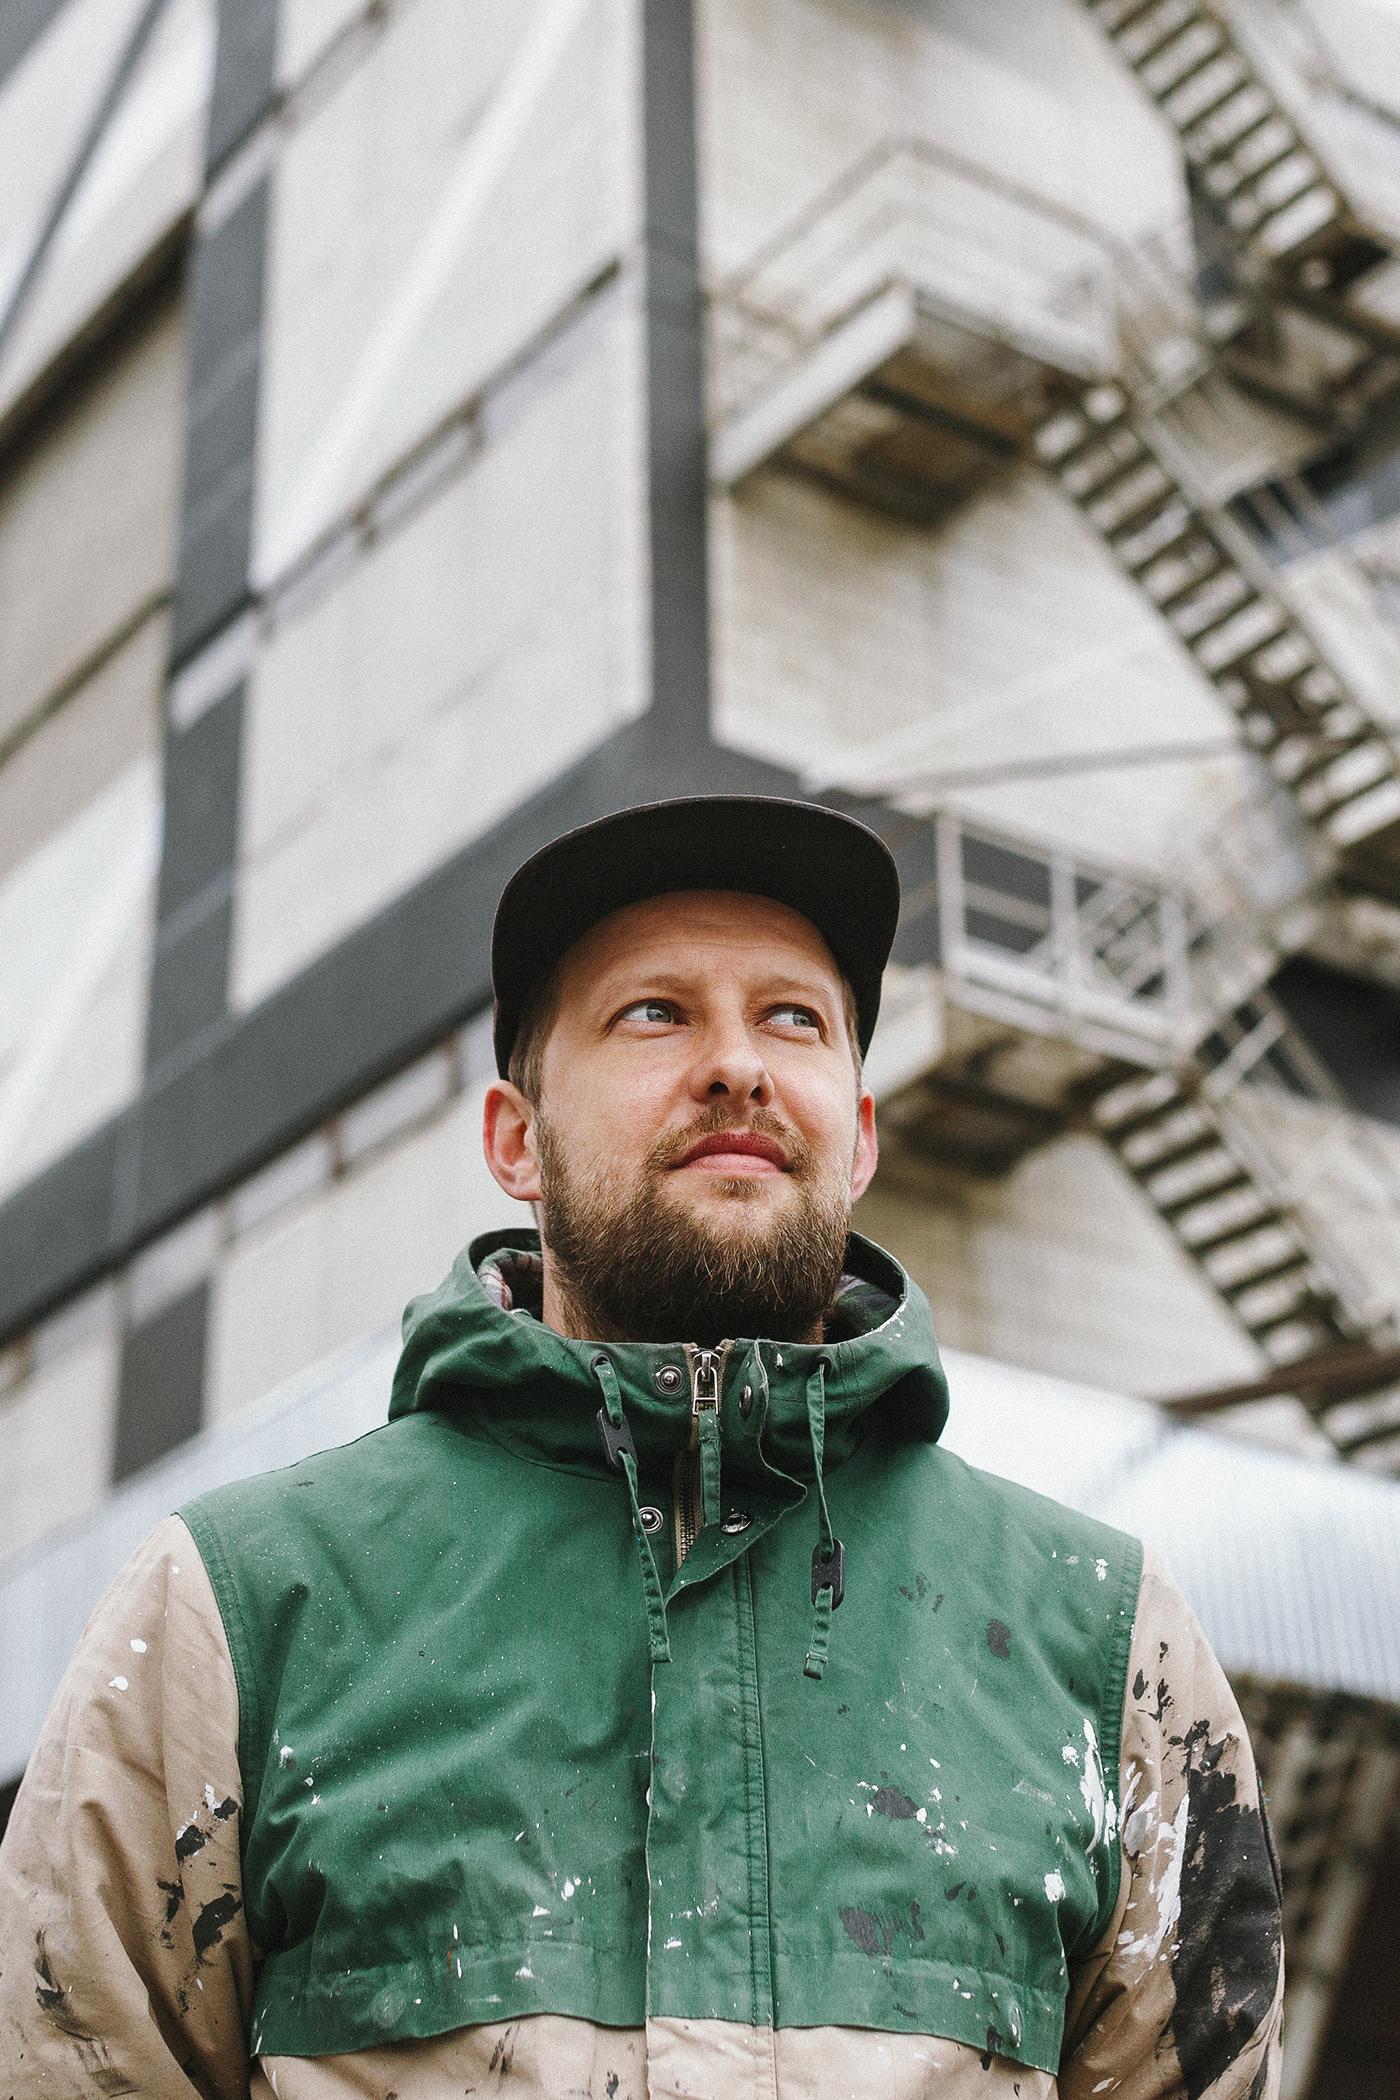 Graffiti industrial Gysbert Zijlstra graphicsurgery  faces&laces